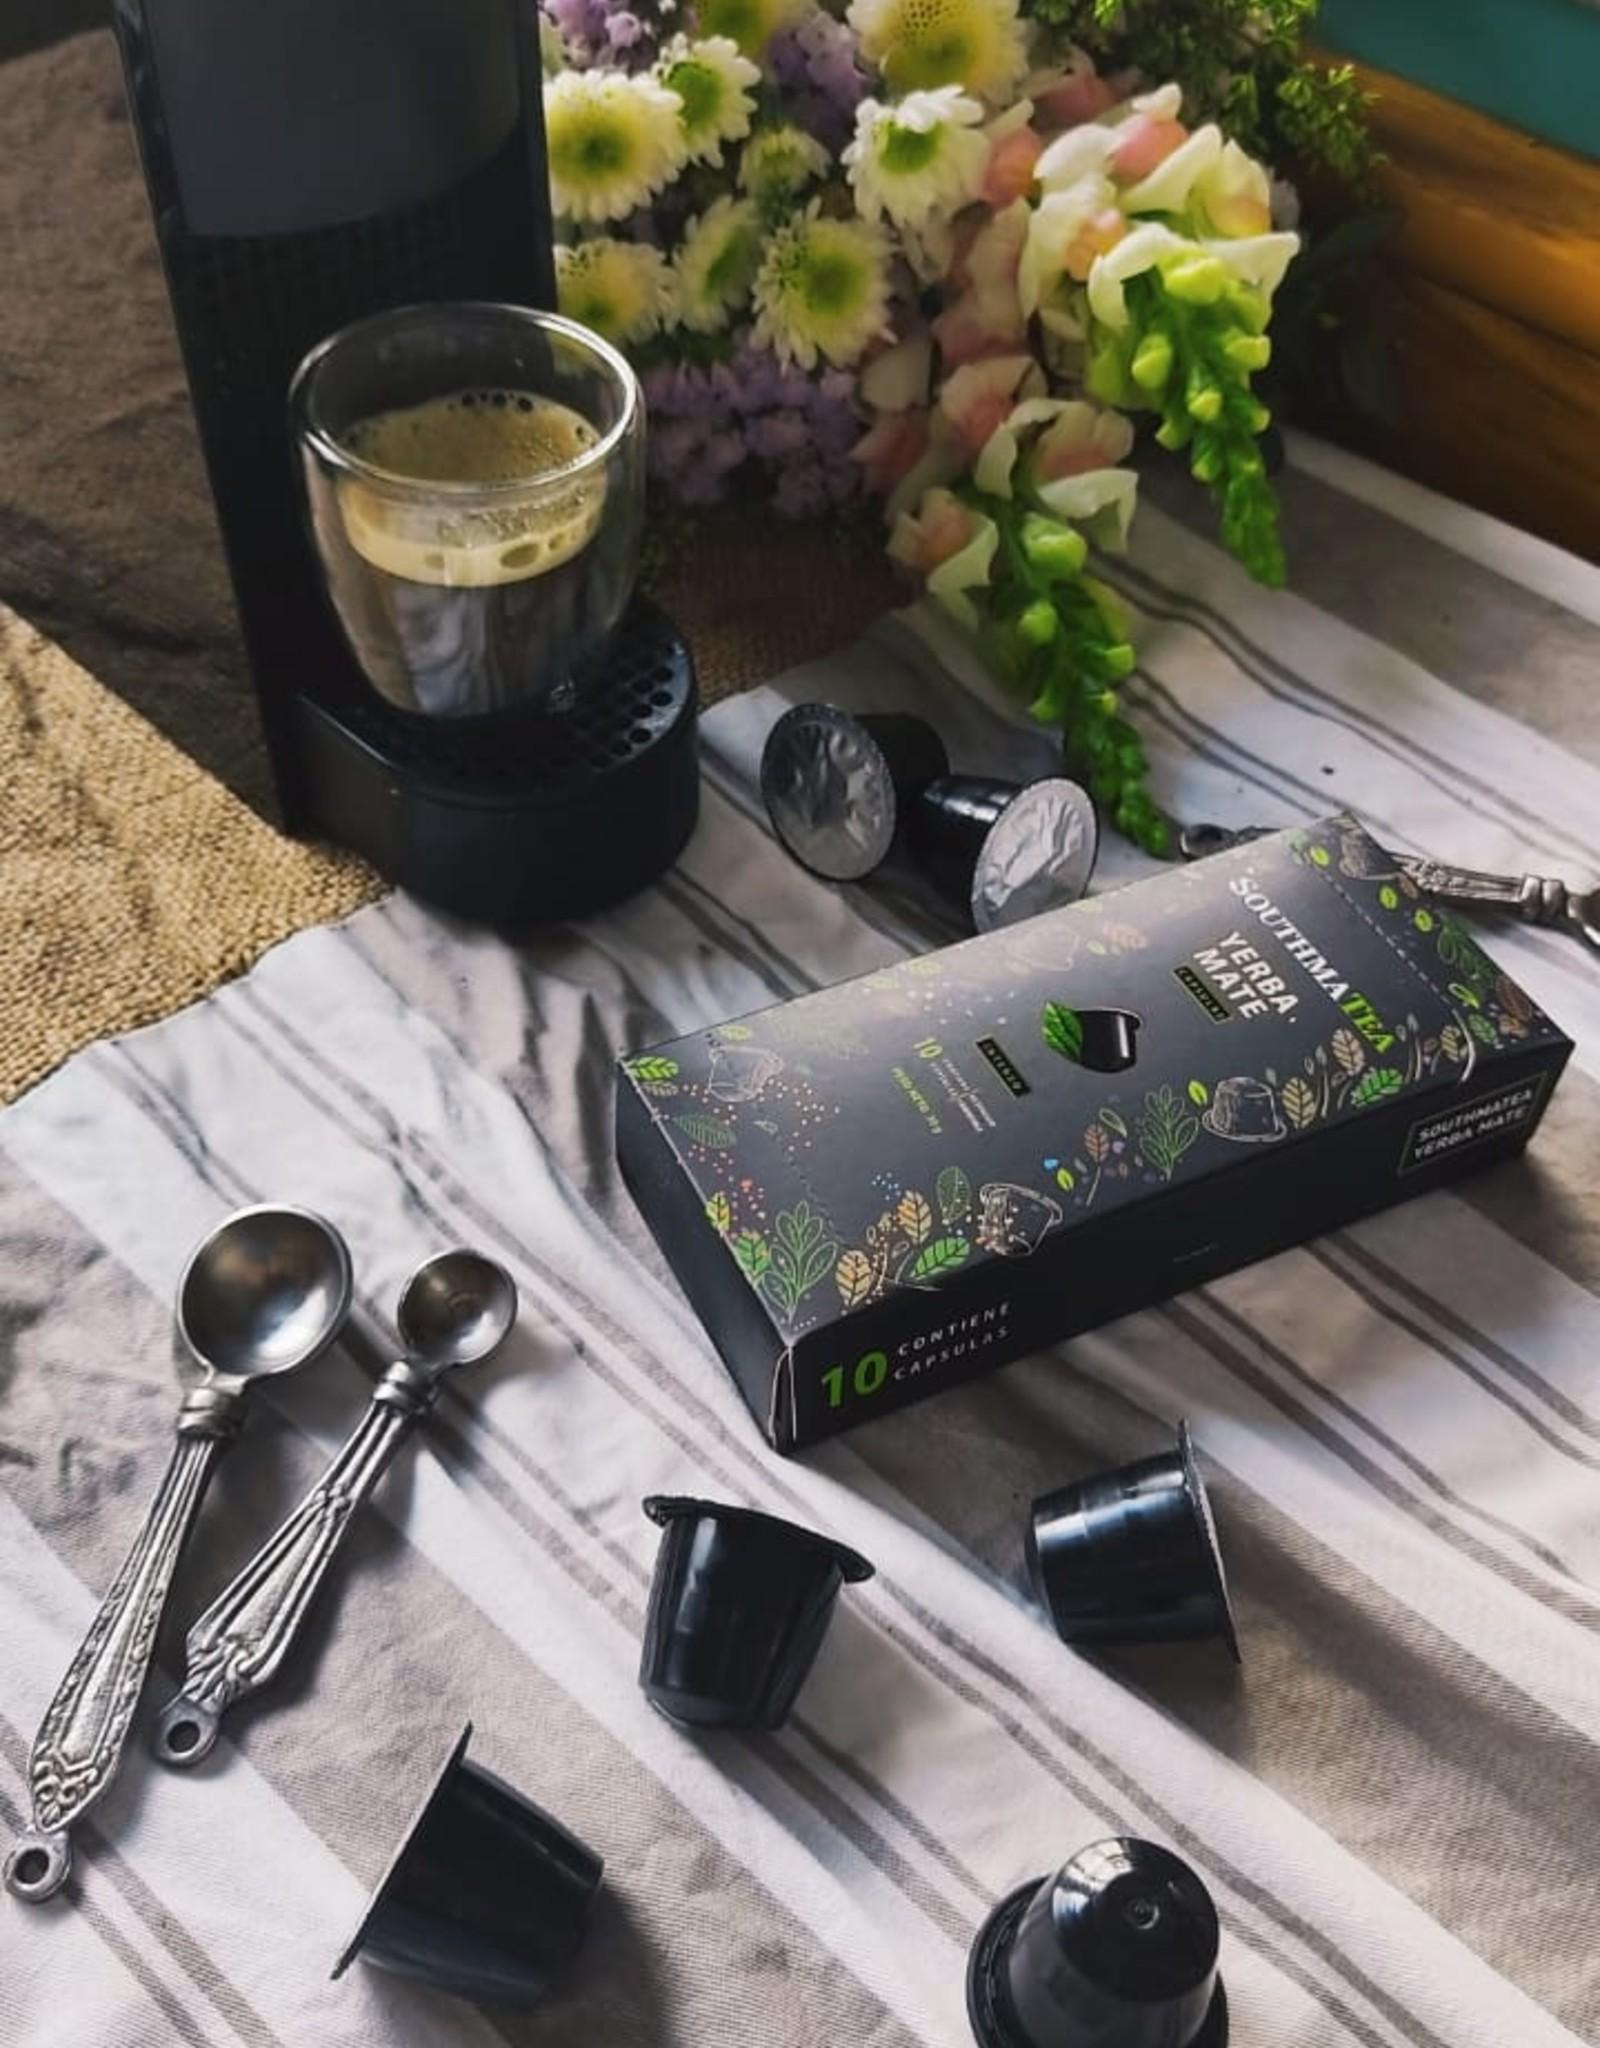 SouthmaTea Capsules de yerba mate (Machines de Nespresso)